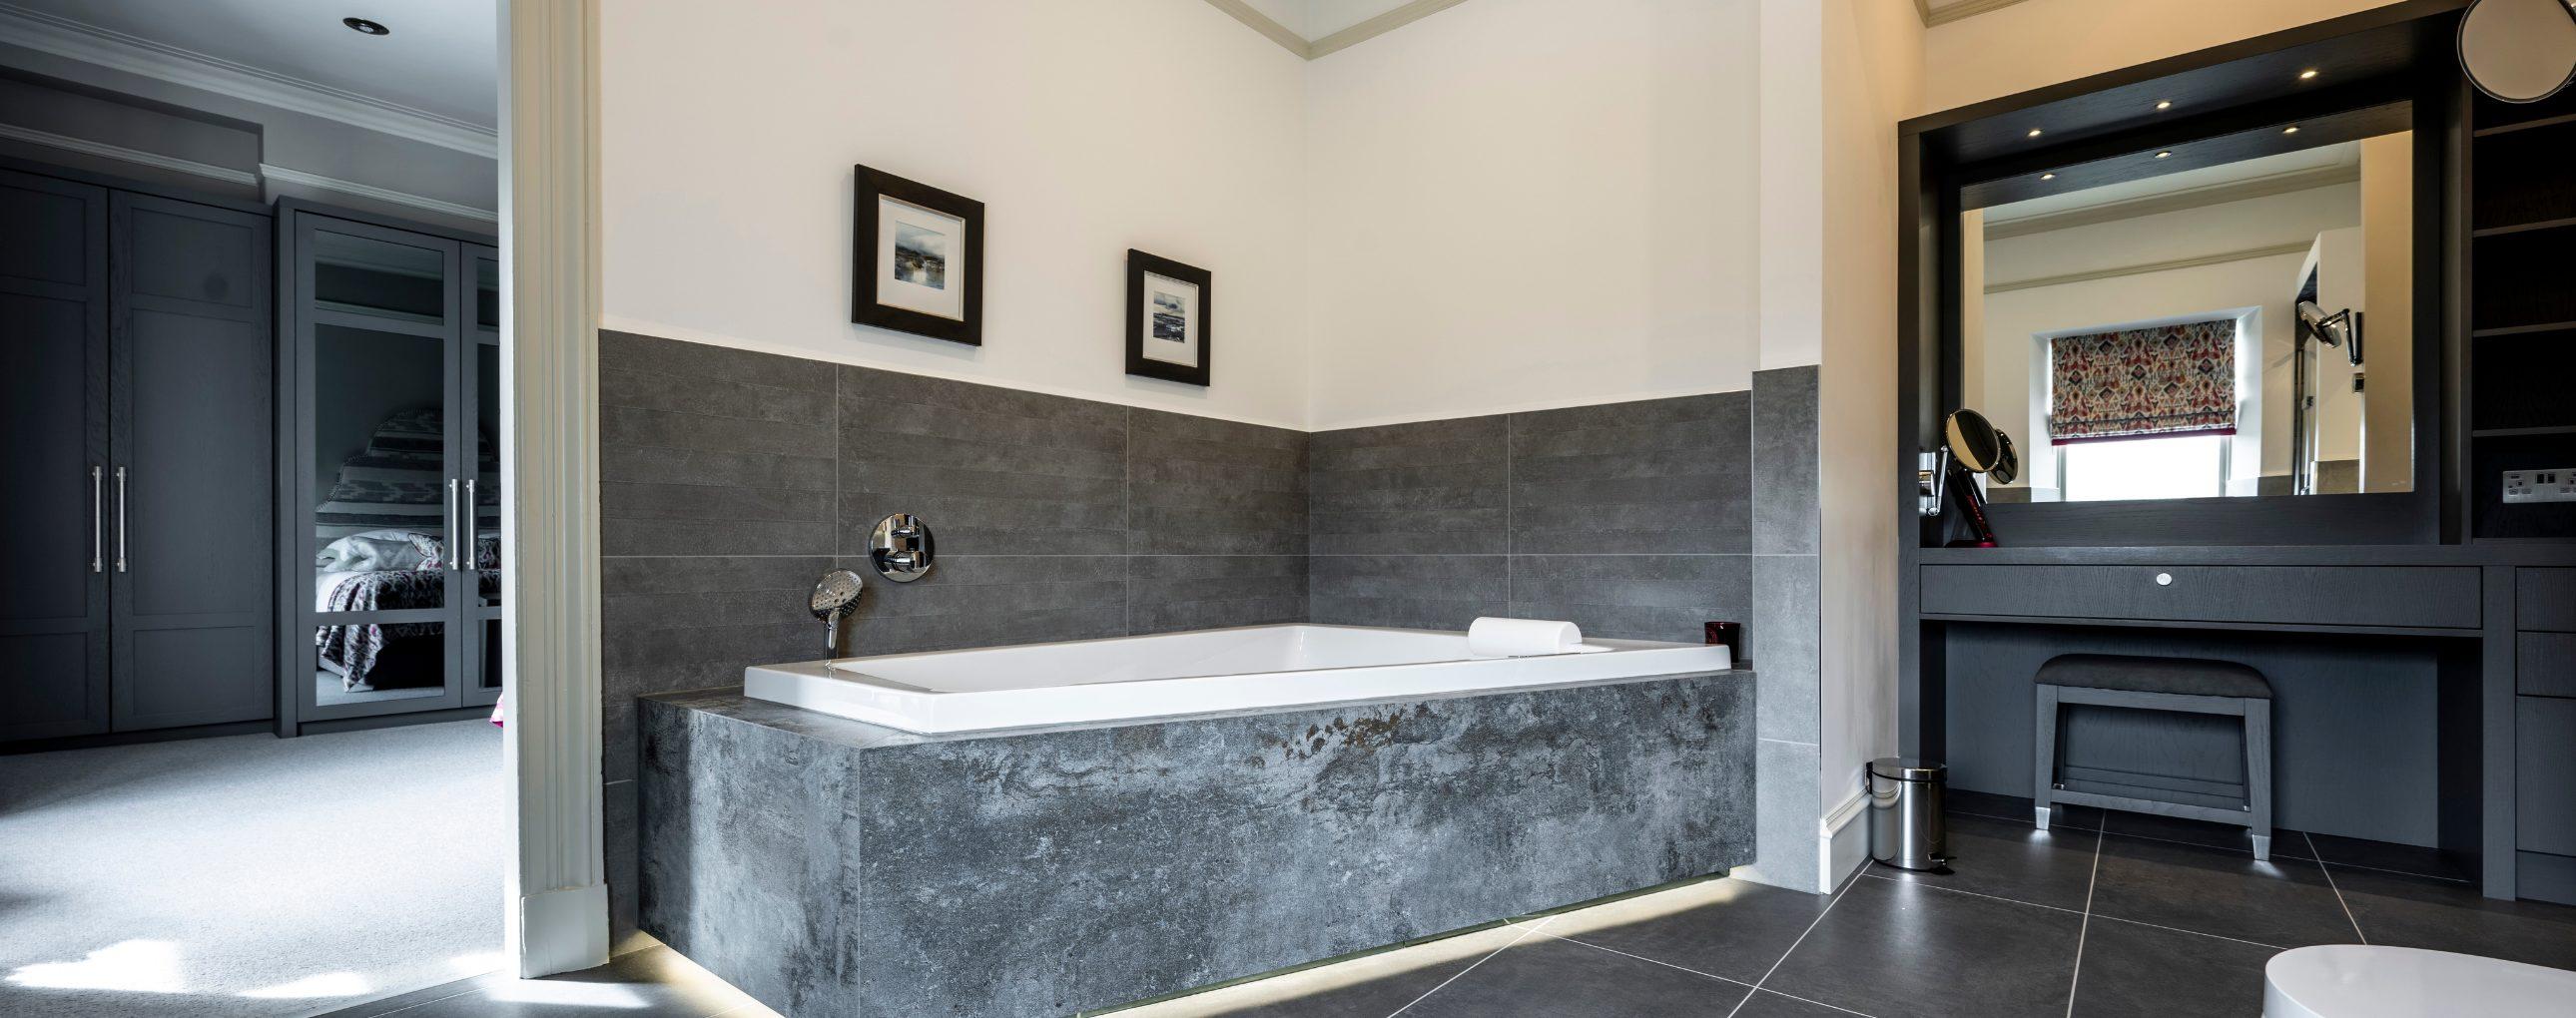 Aberdeen Bathroom & Dressing Room